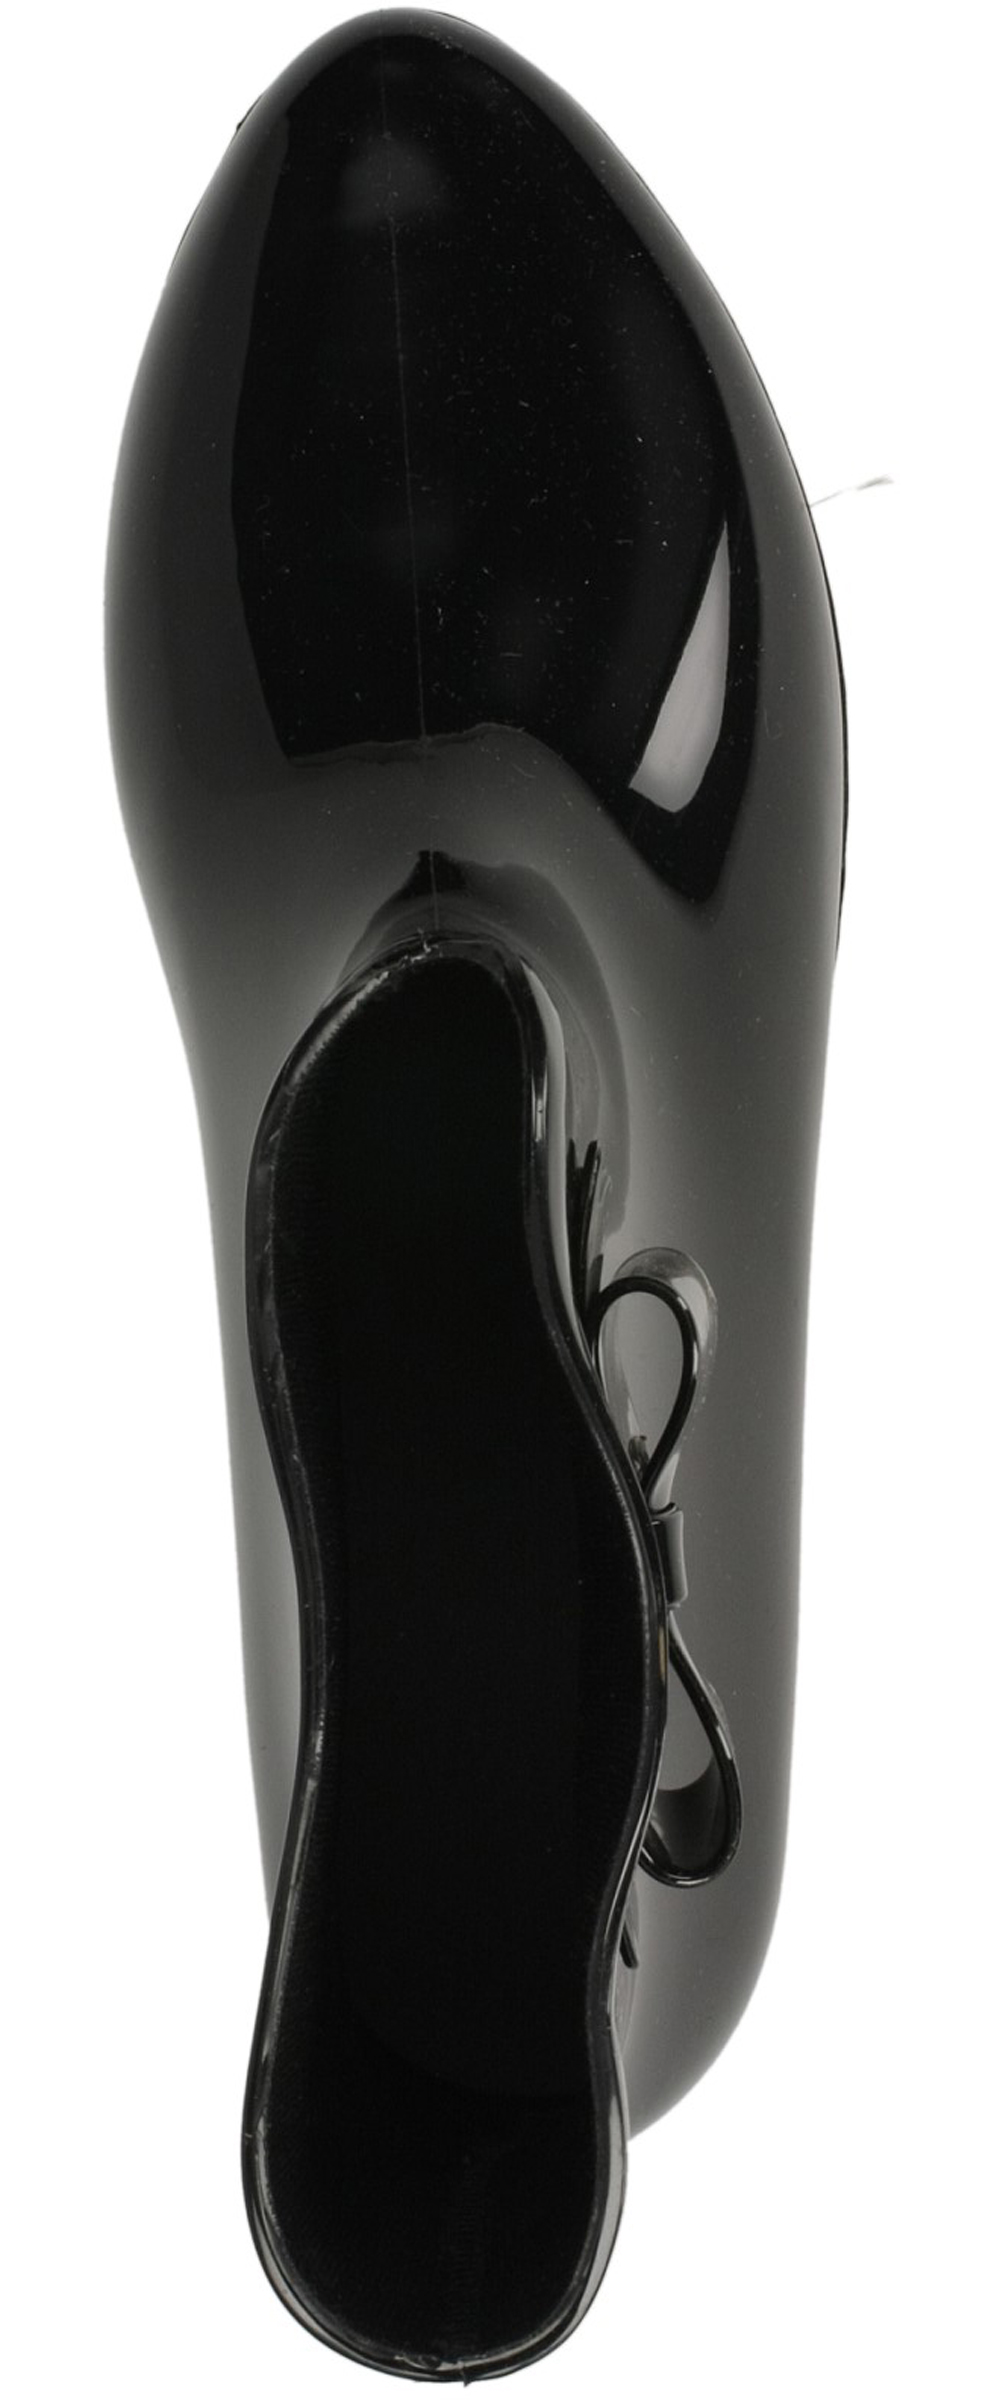 MELISKI CASU T8450 kolor czarny